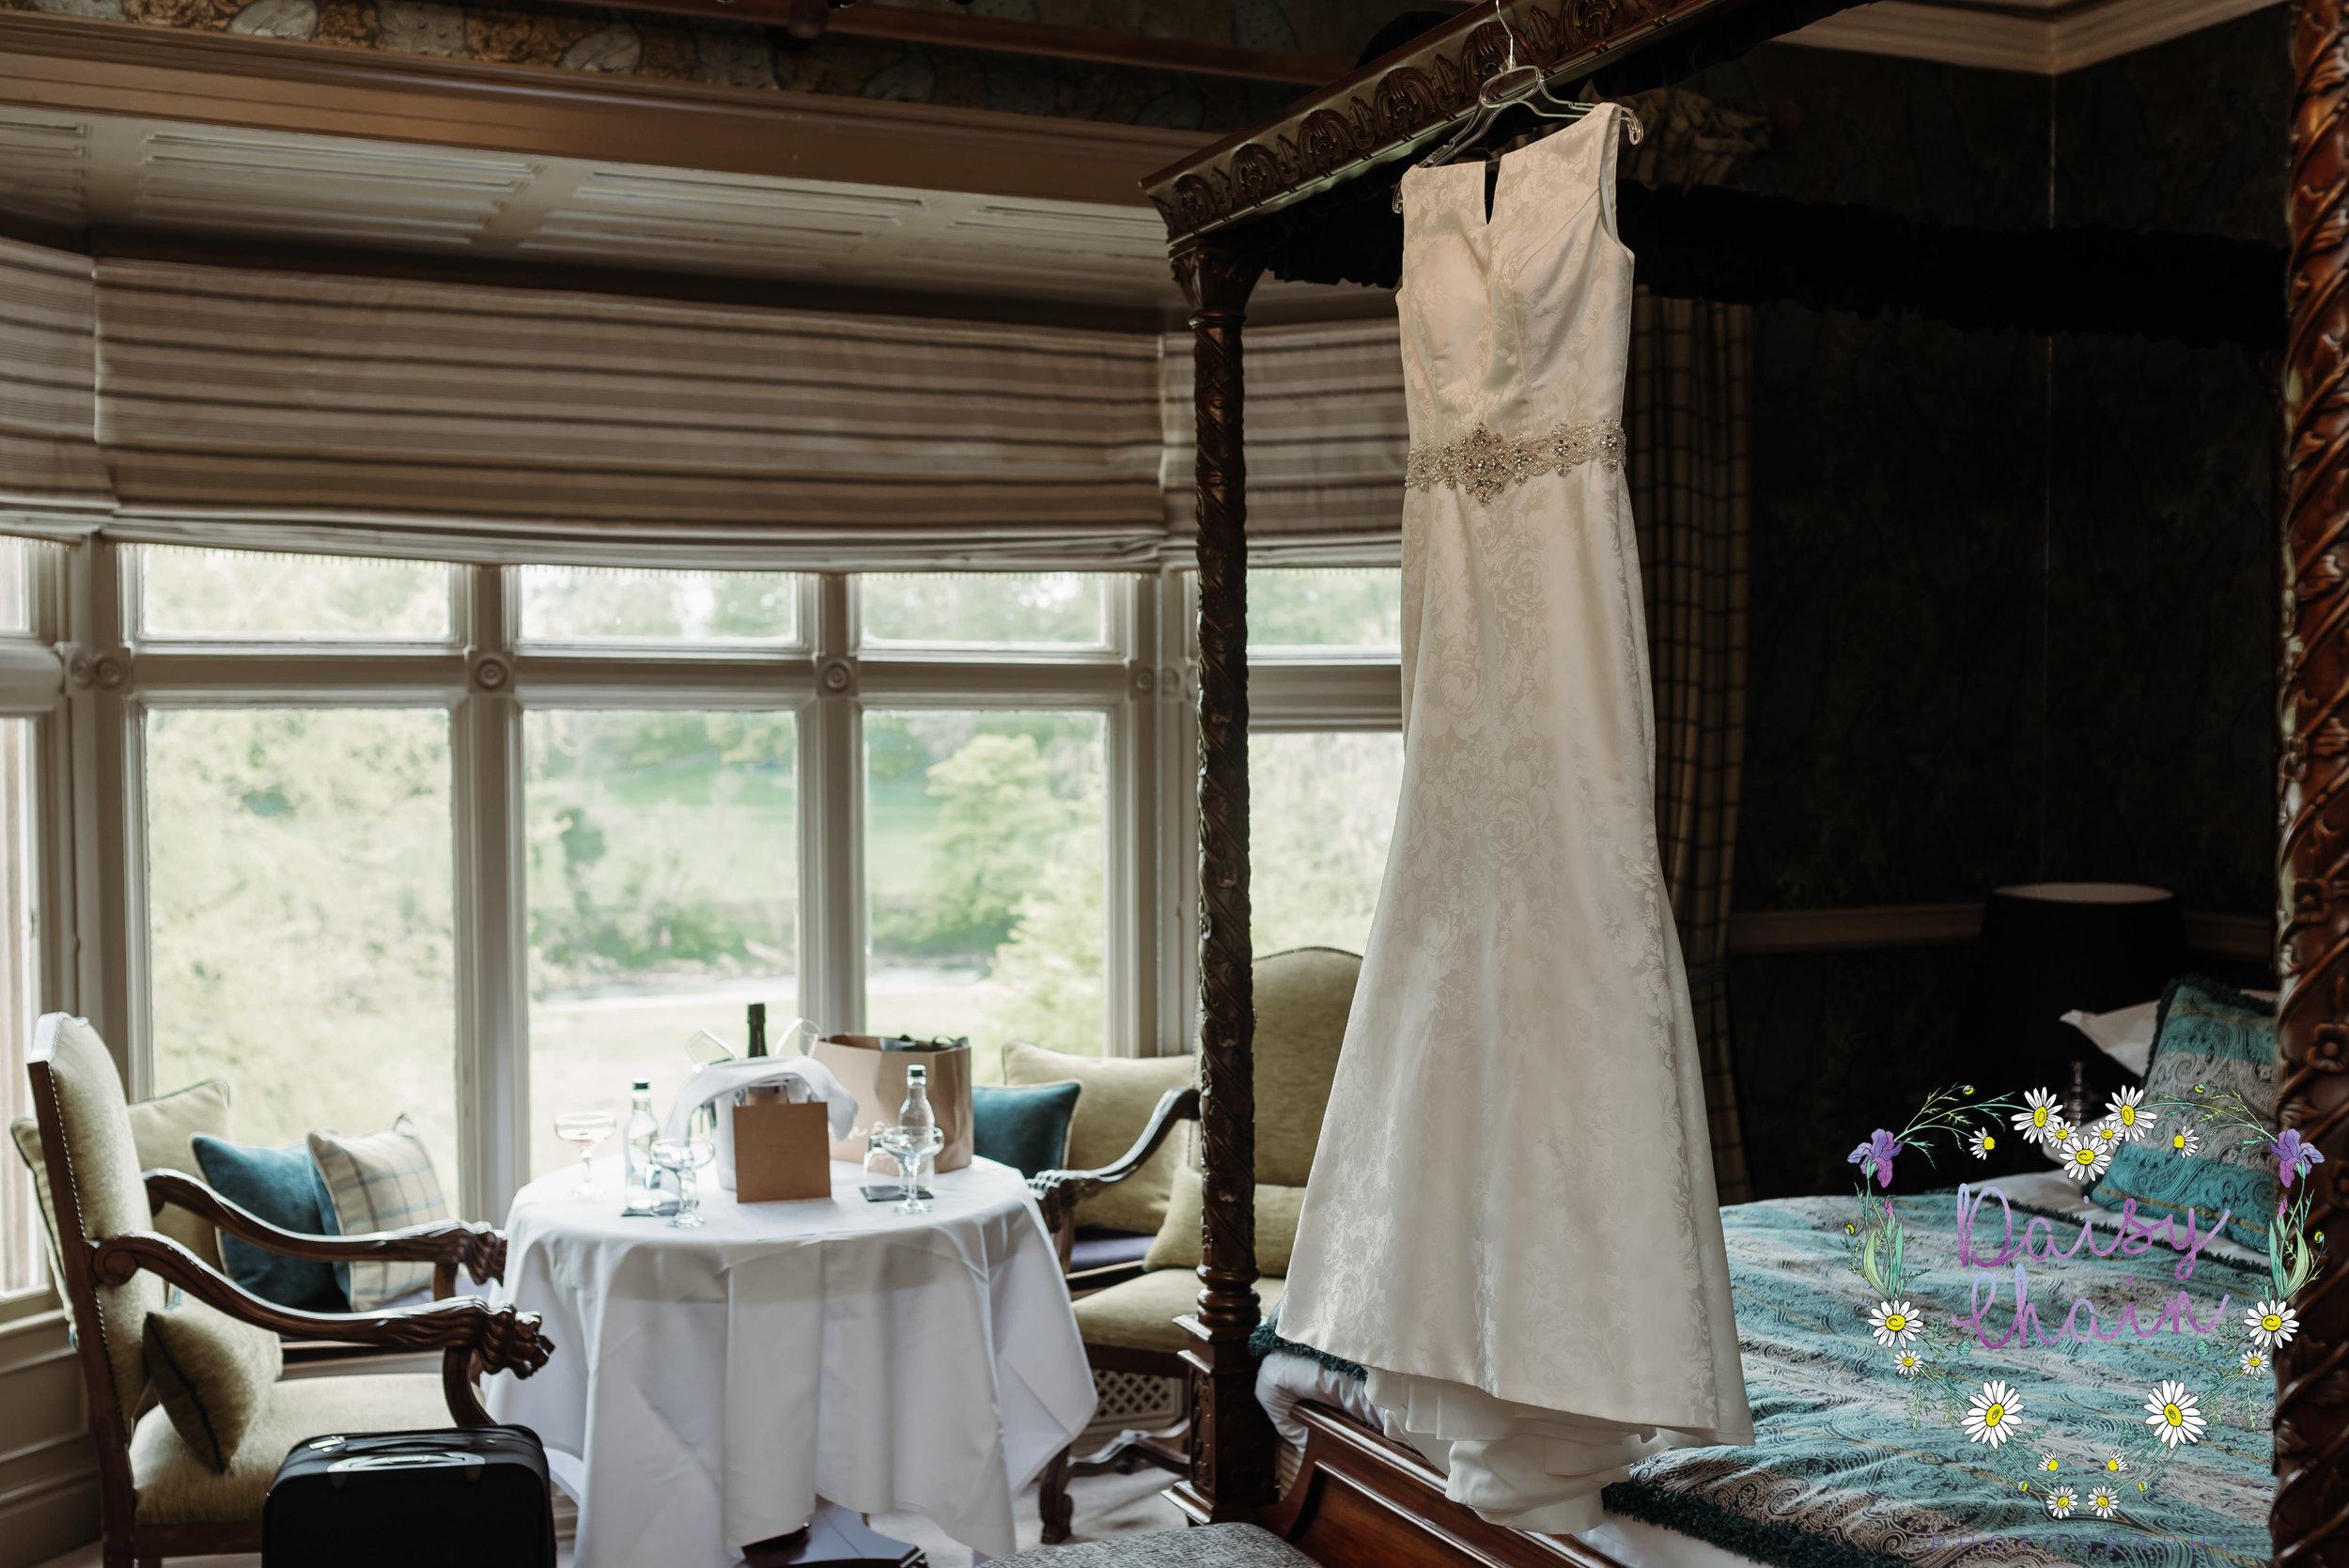 Mitton Hall bridal suite